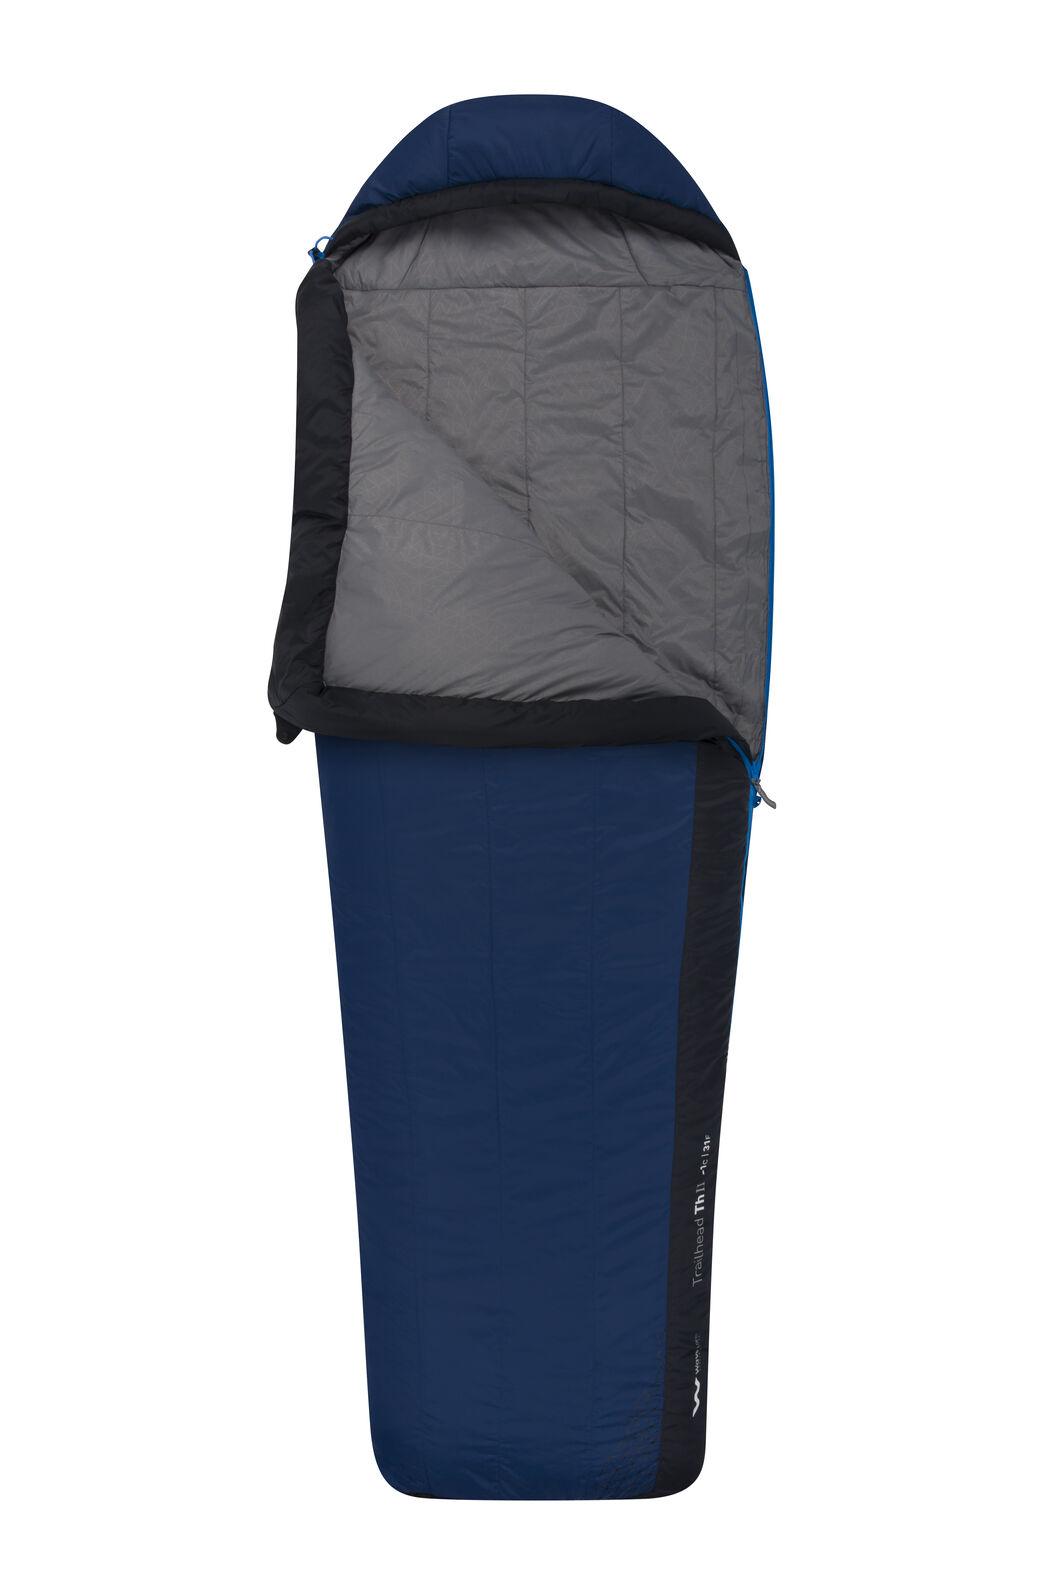 Sea to Summit Trailhead II Sleeping Bag - Regular, Dark Blue, hi-res